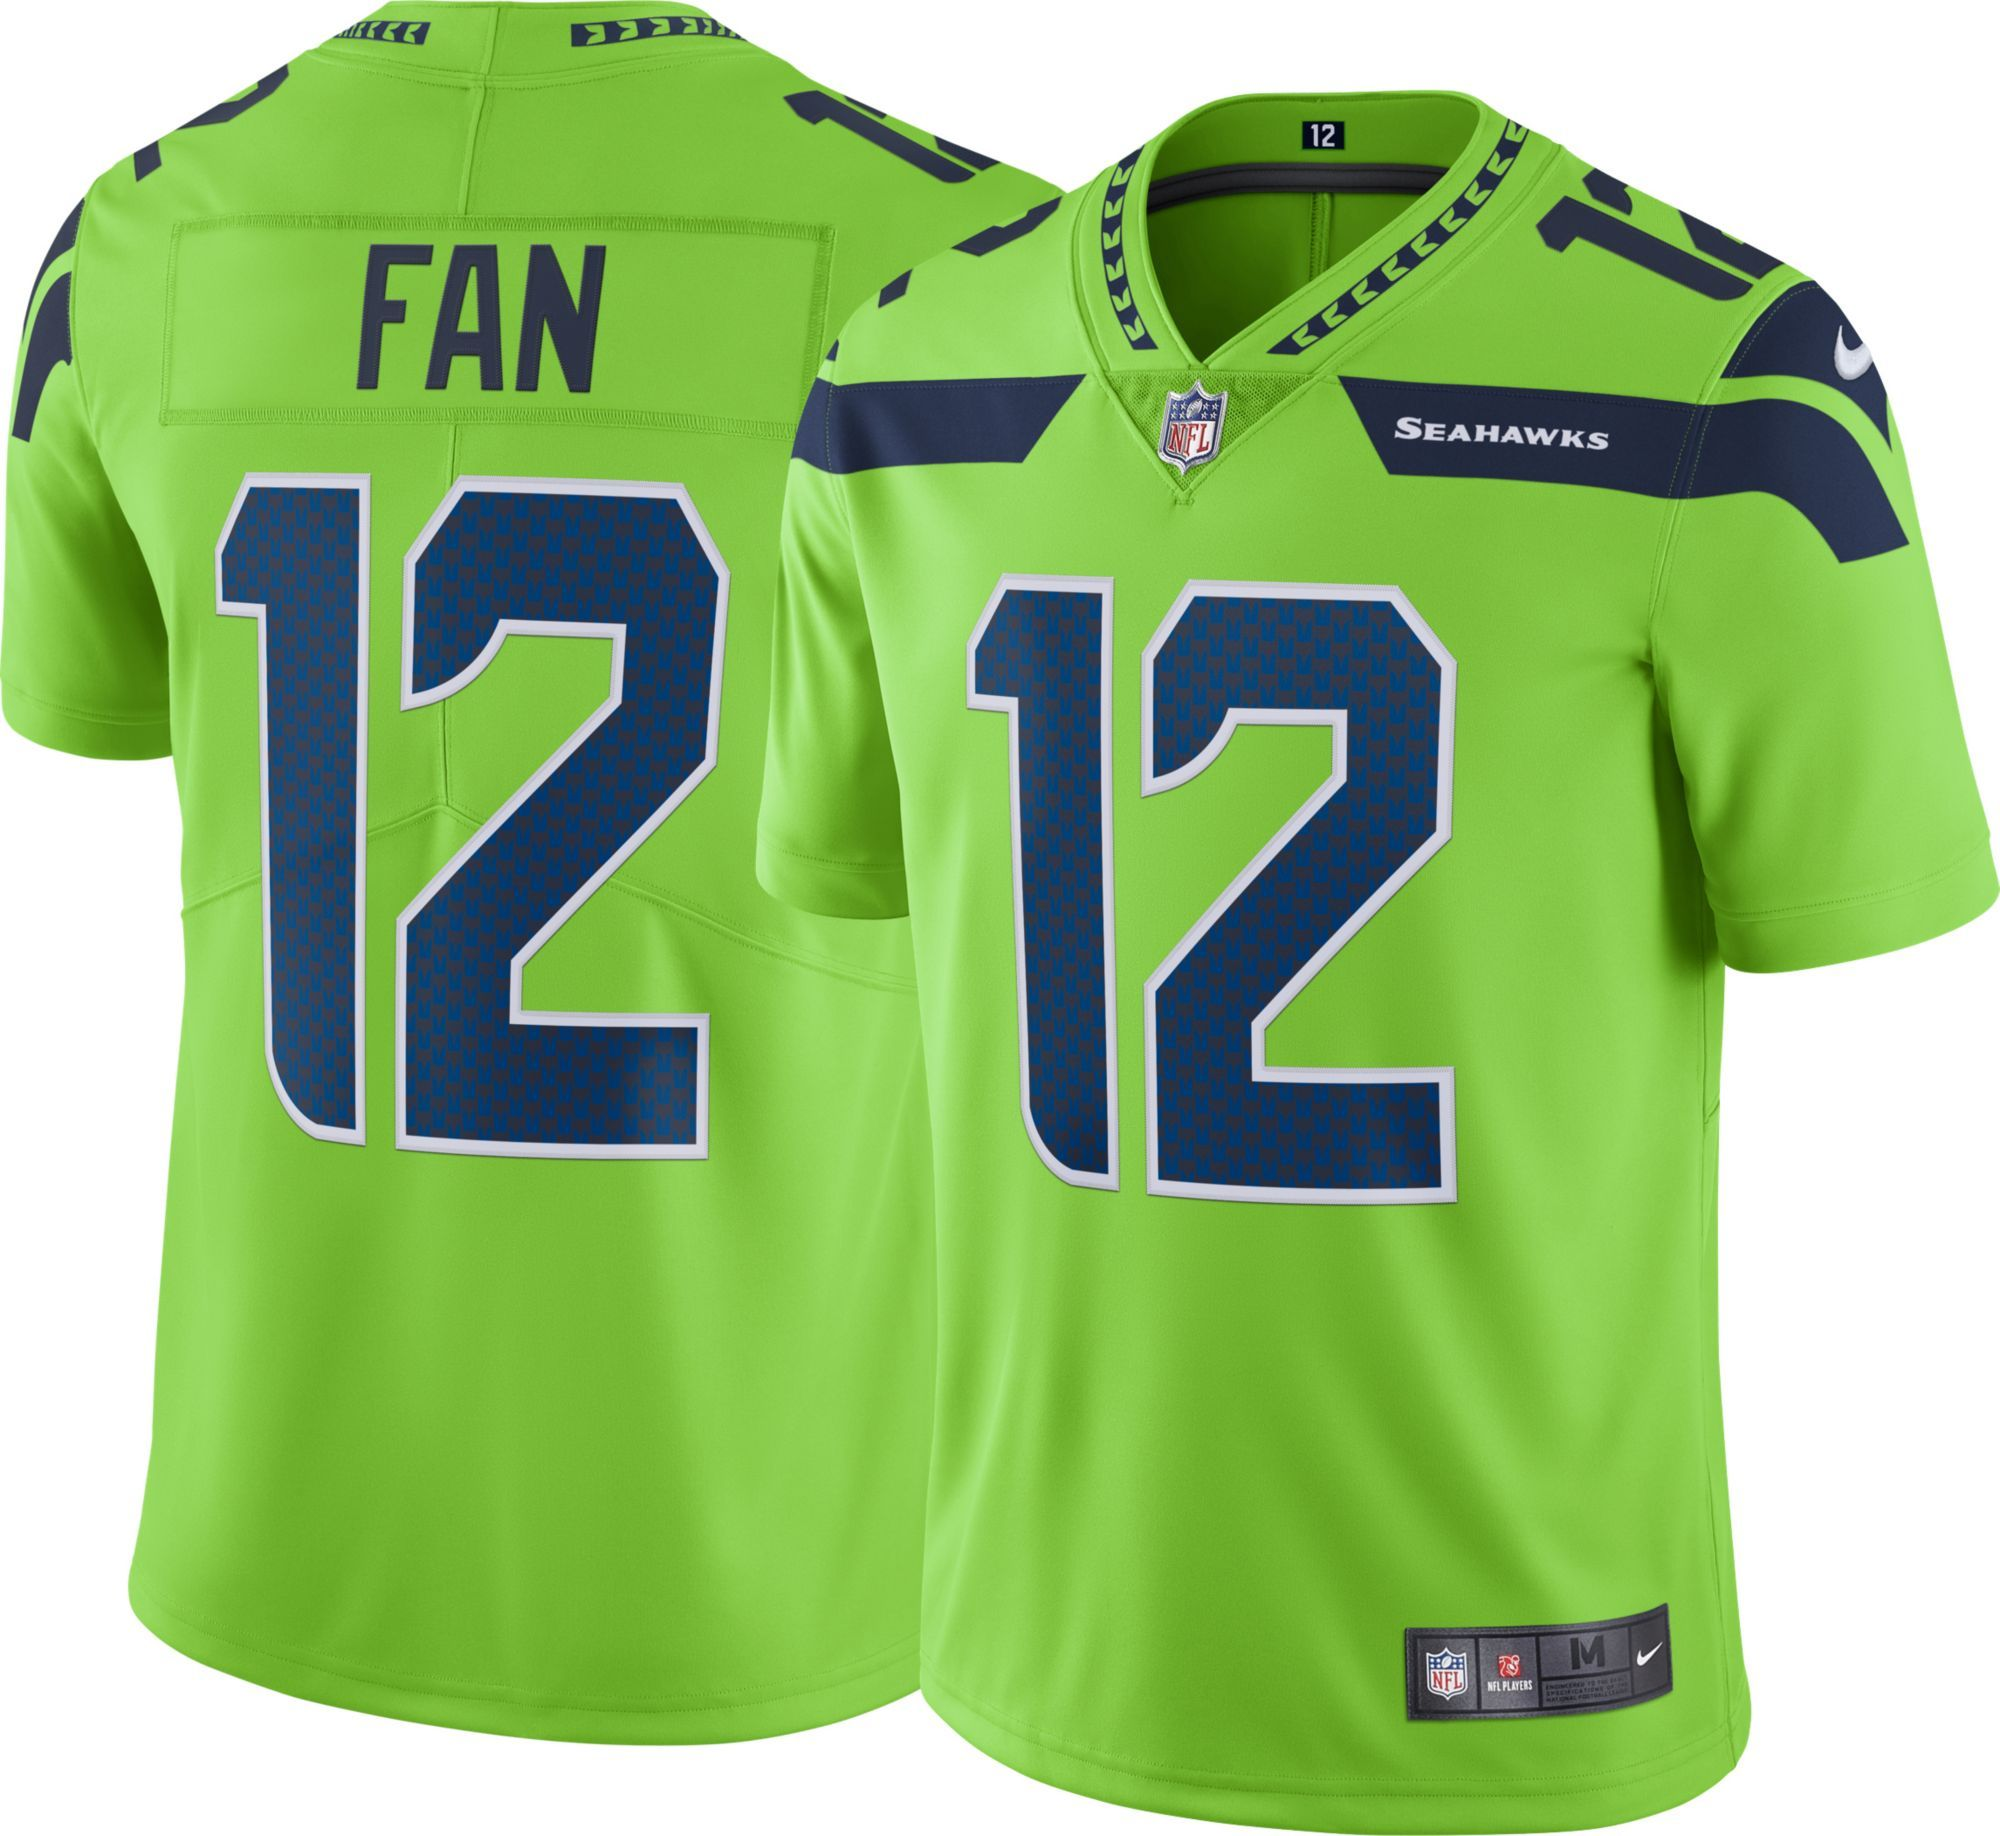 cba5a1f5 Nike Men's Color Rush Limited Jersey Seattle Seahawks 12th Fan #12 ...